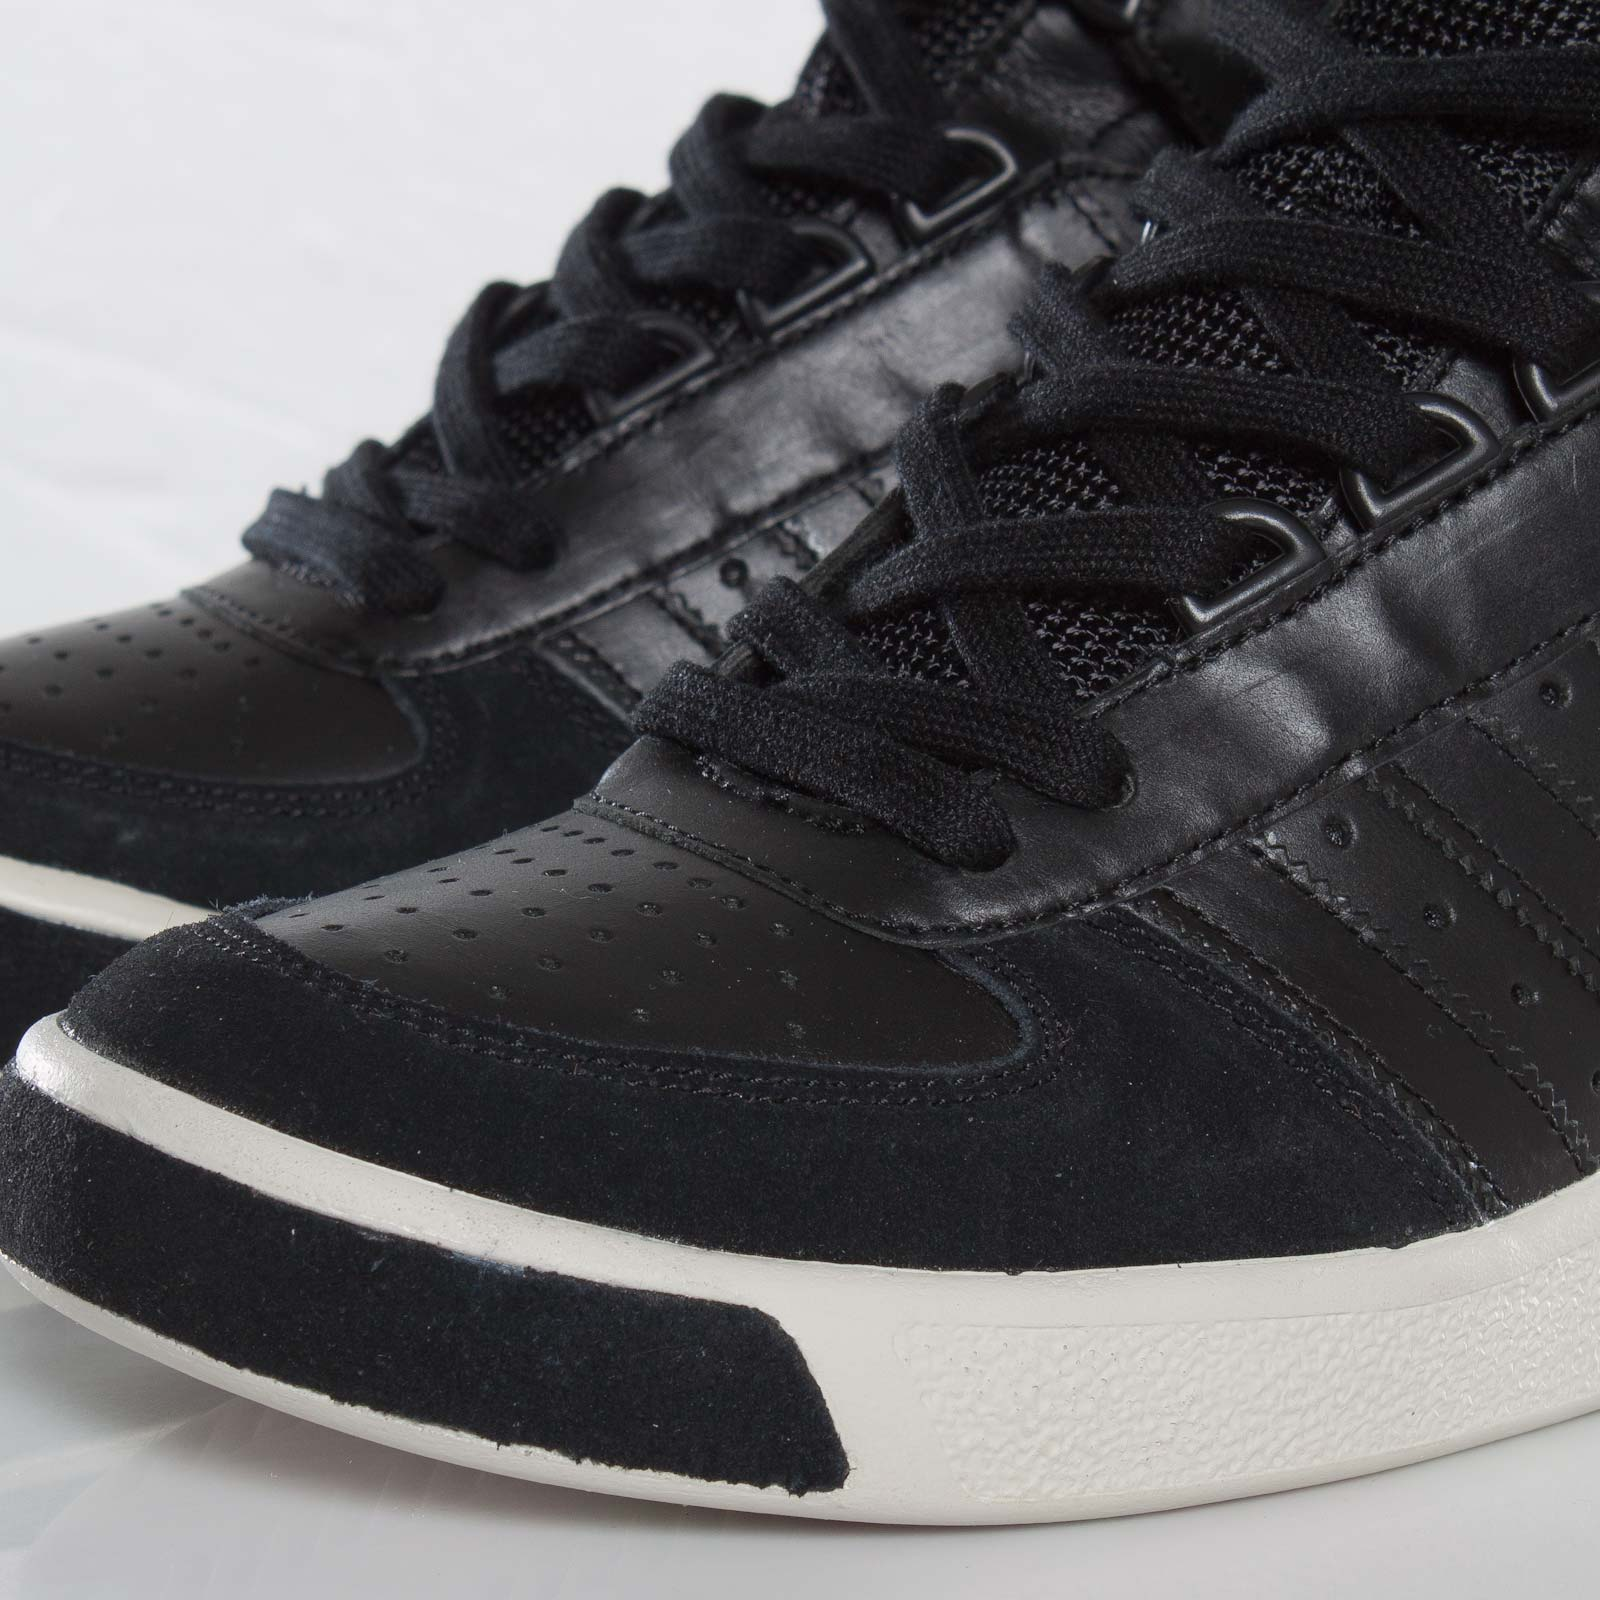 adidas G.S. ST G60643 Sneakersnstuff   sneakers